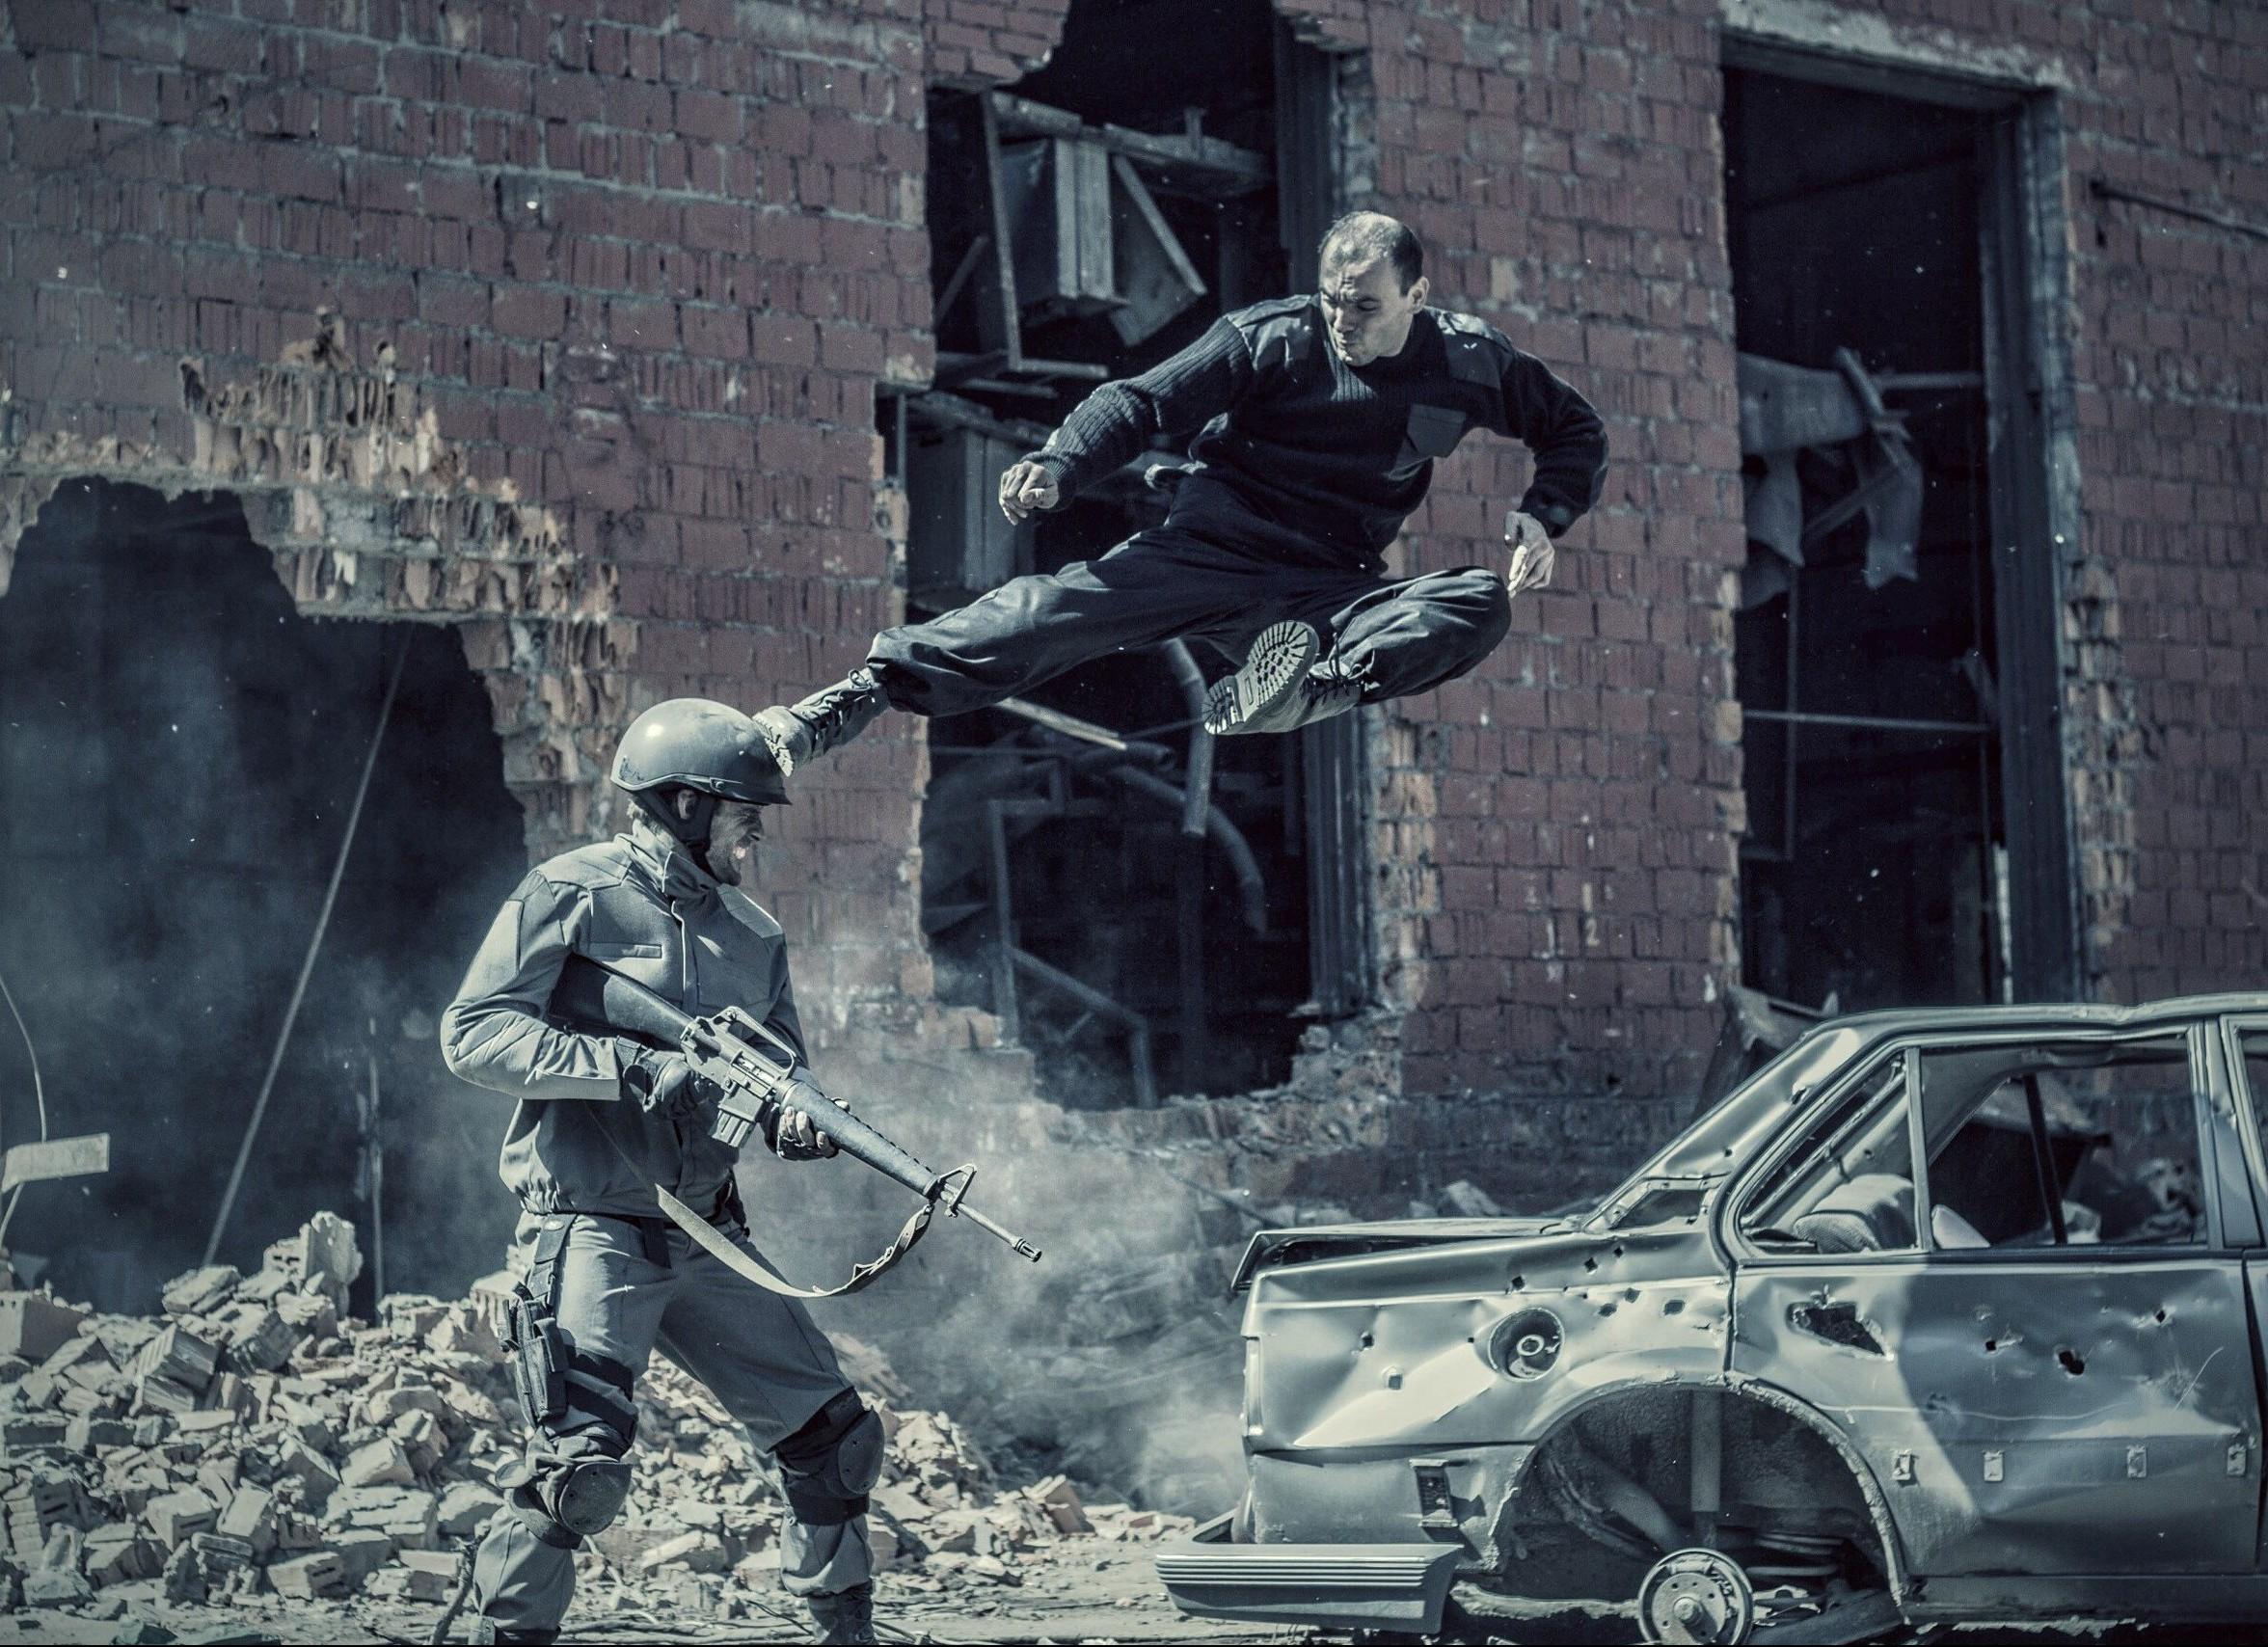 Русская команда каскадёров Сергея Морина - Dragon Brothers (DB) 2